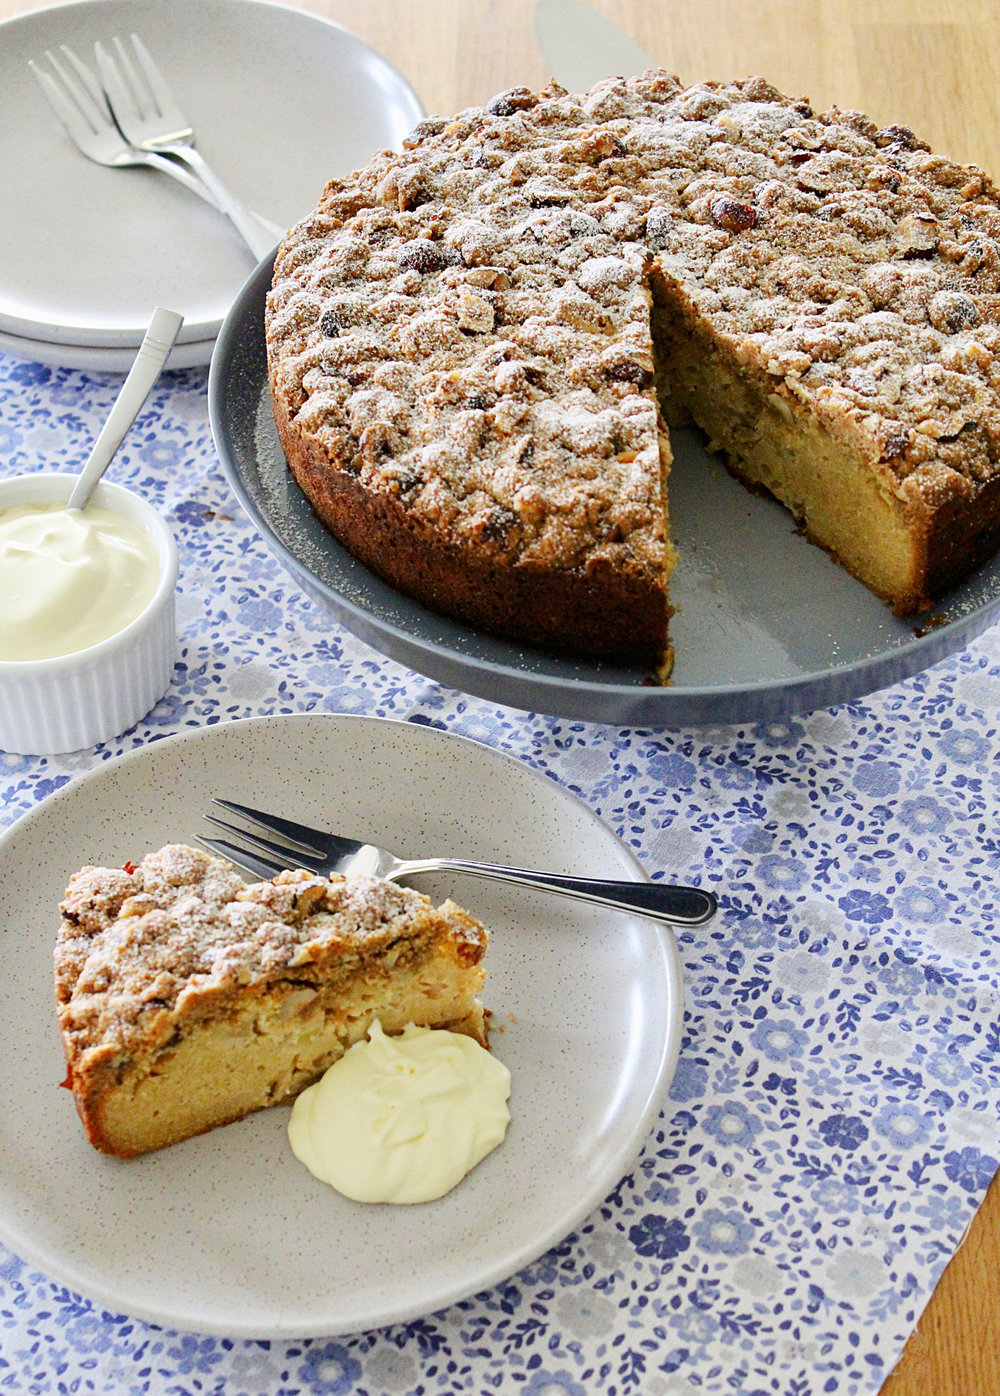 Apple Sour Cream Cake with Hazelnut Crumble 2.jpg